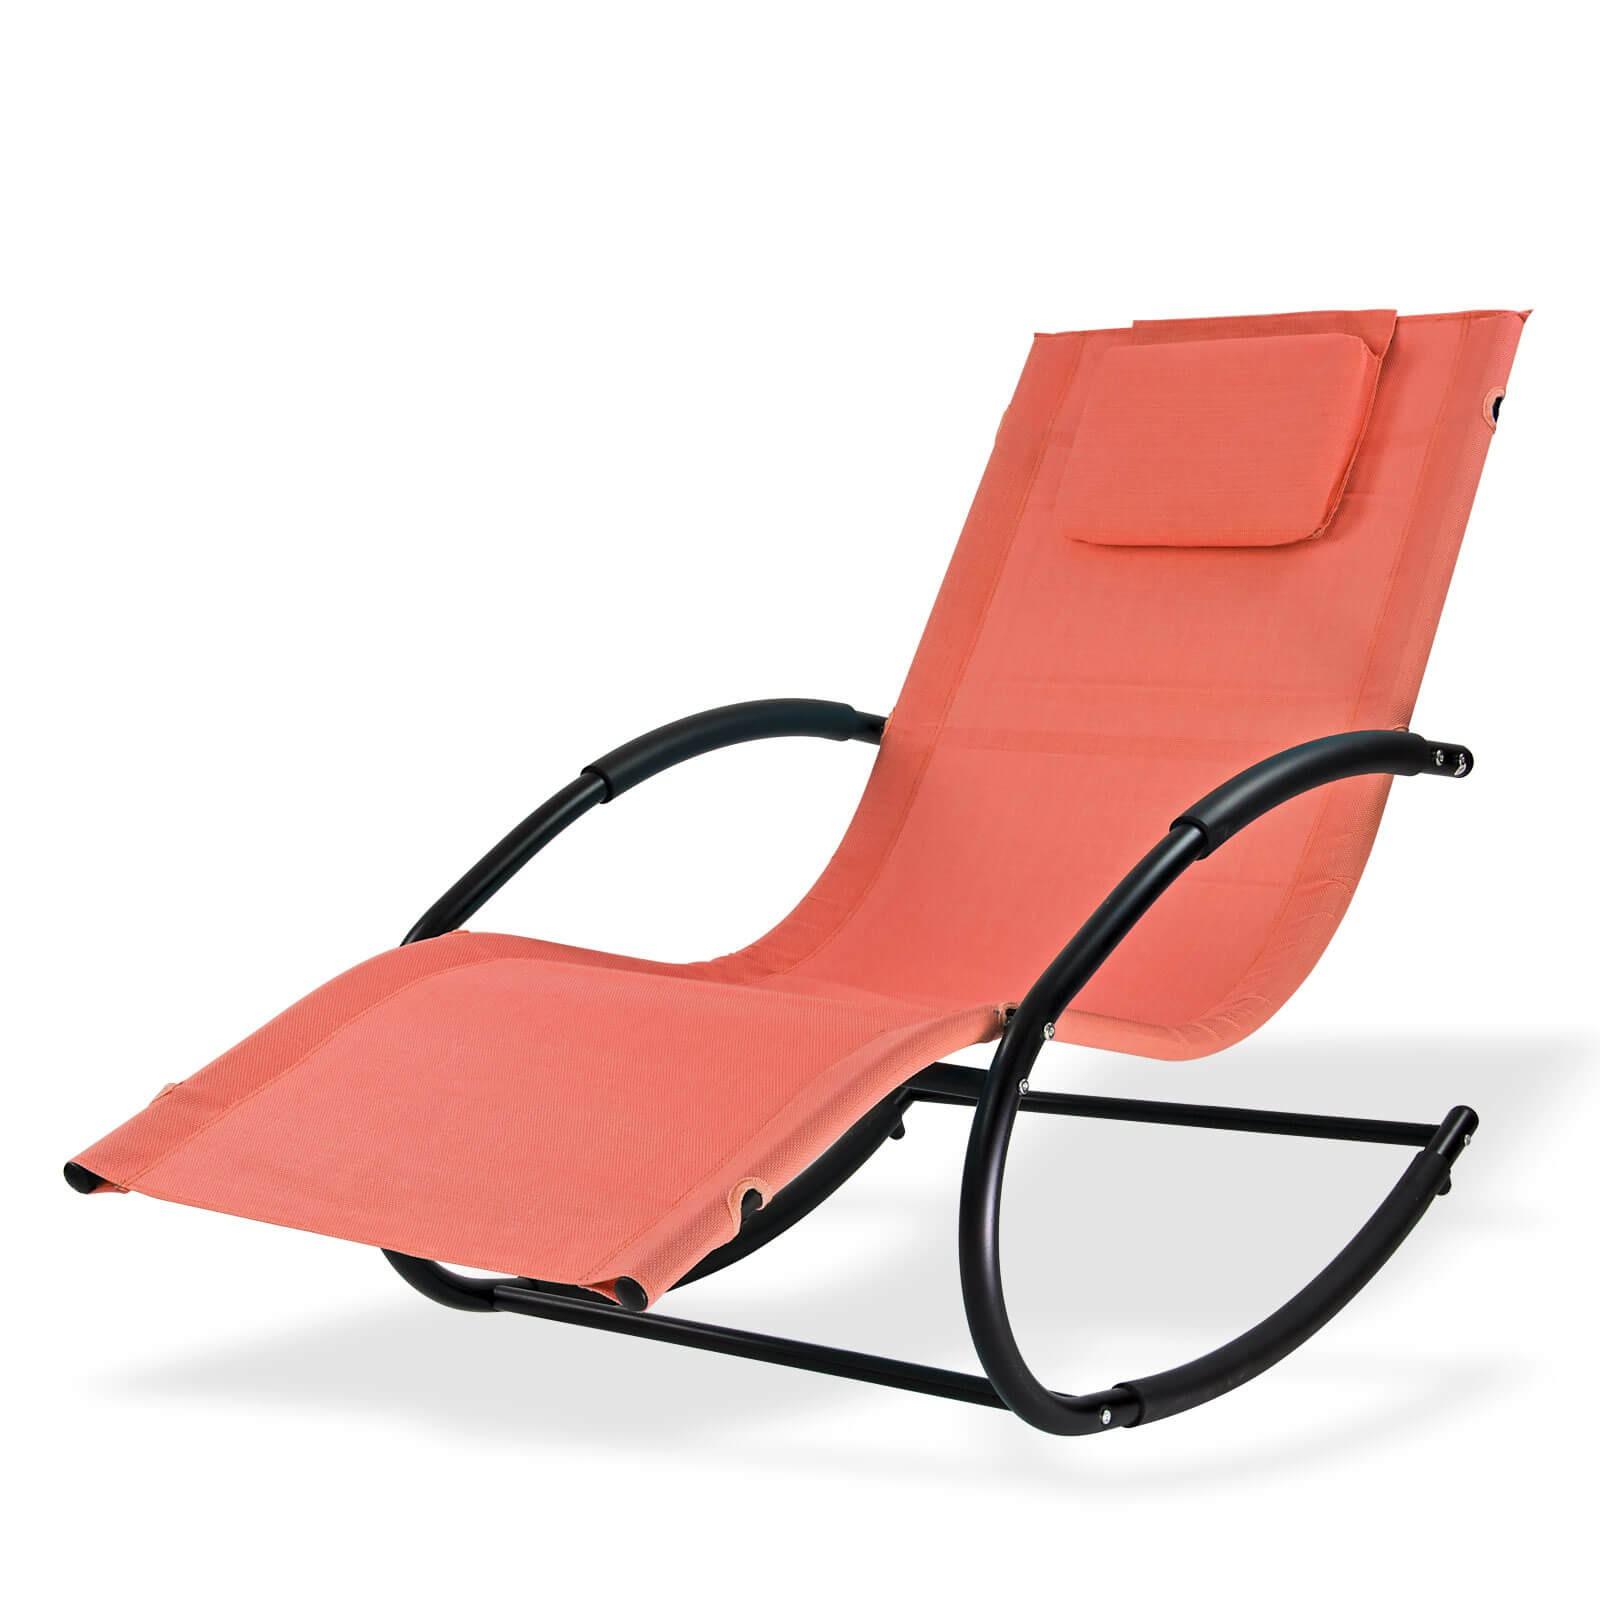 Dema Sonnenliege / Relaxliege Swing - Farbe nach Wahl 94087